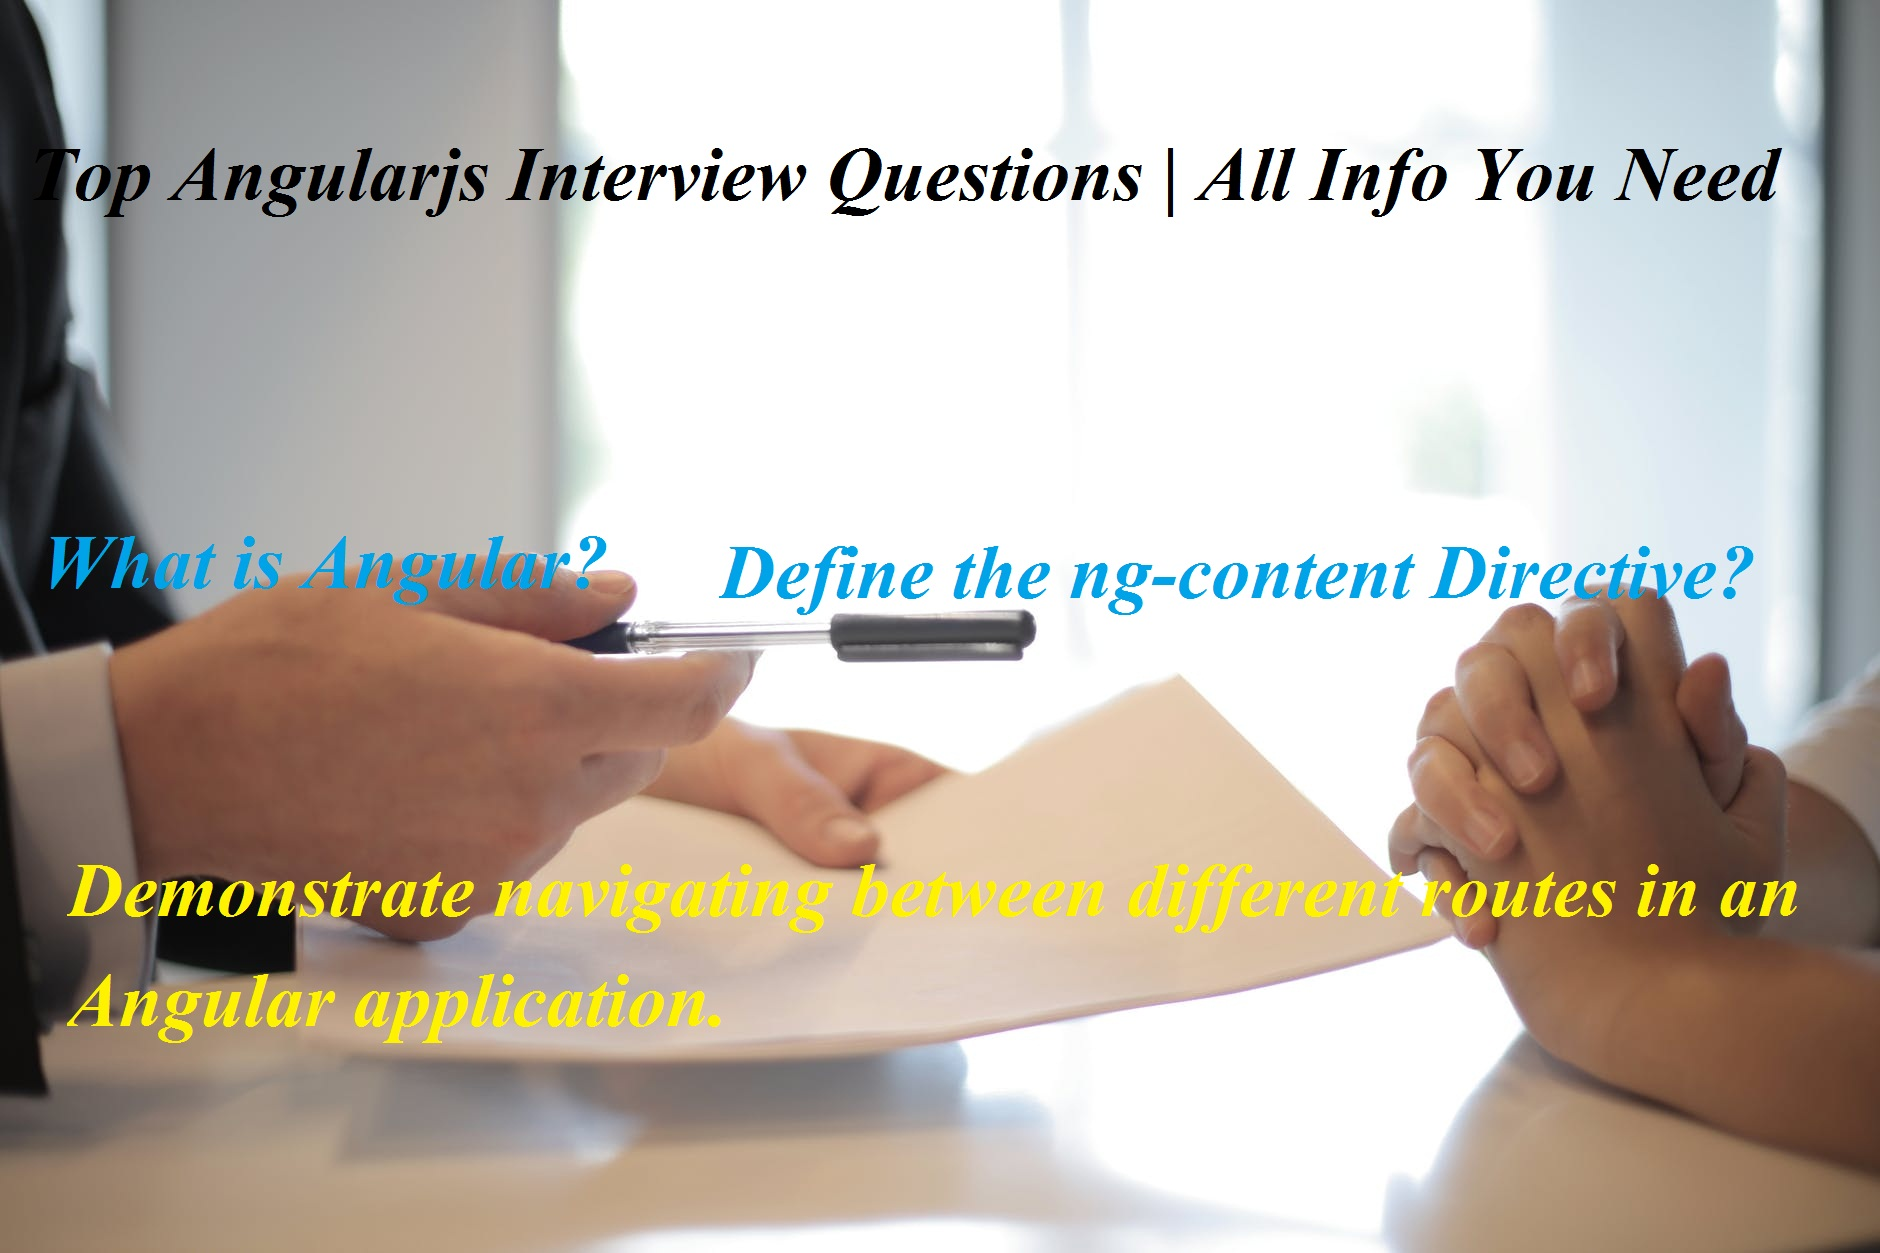 Angularjs Interview Questions